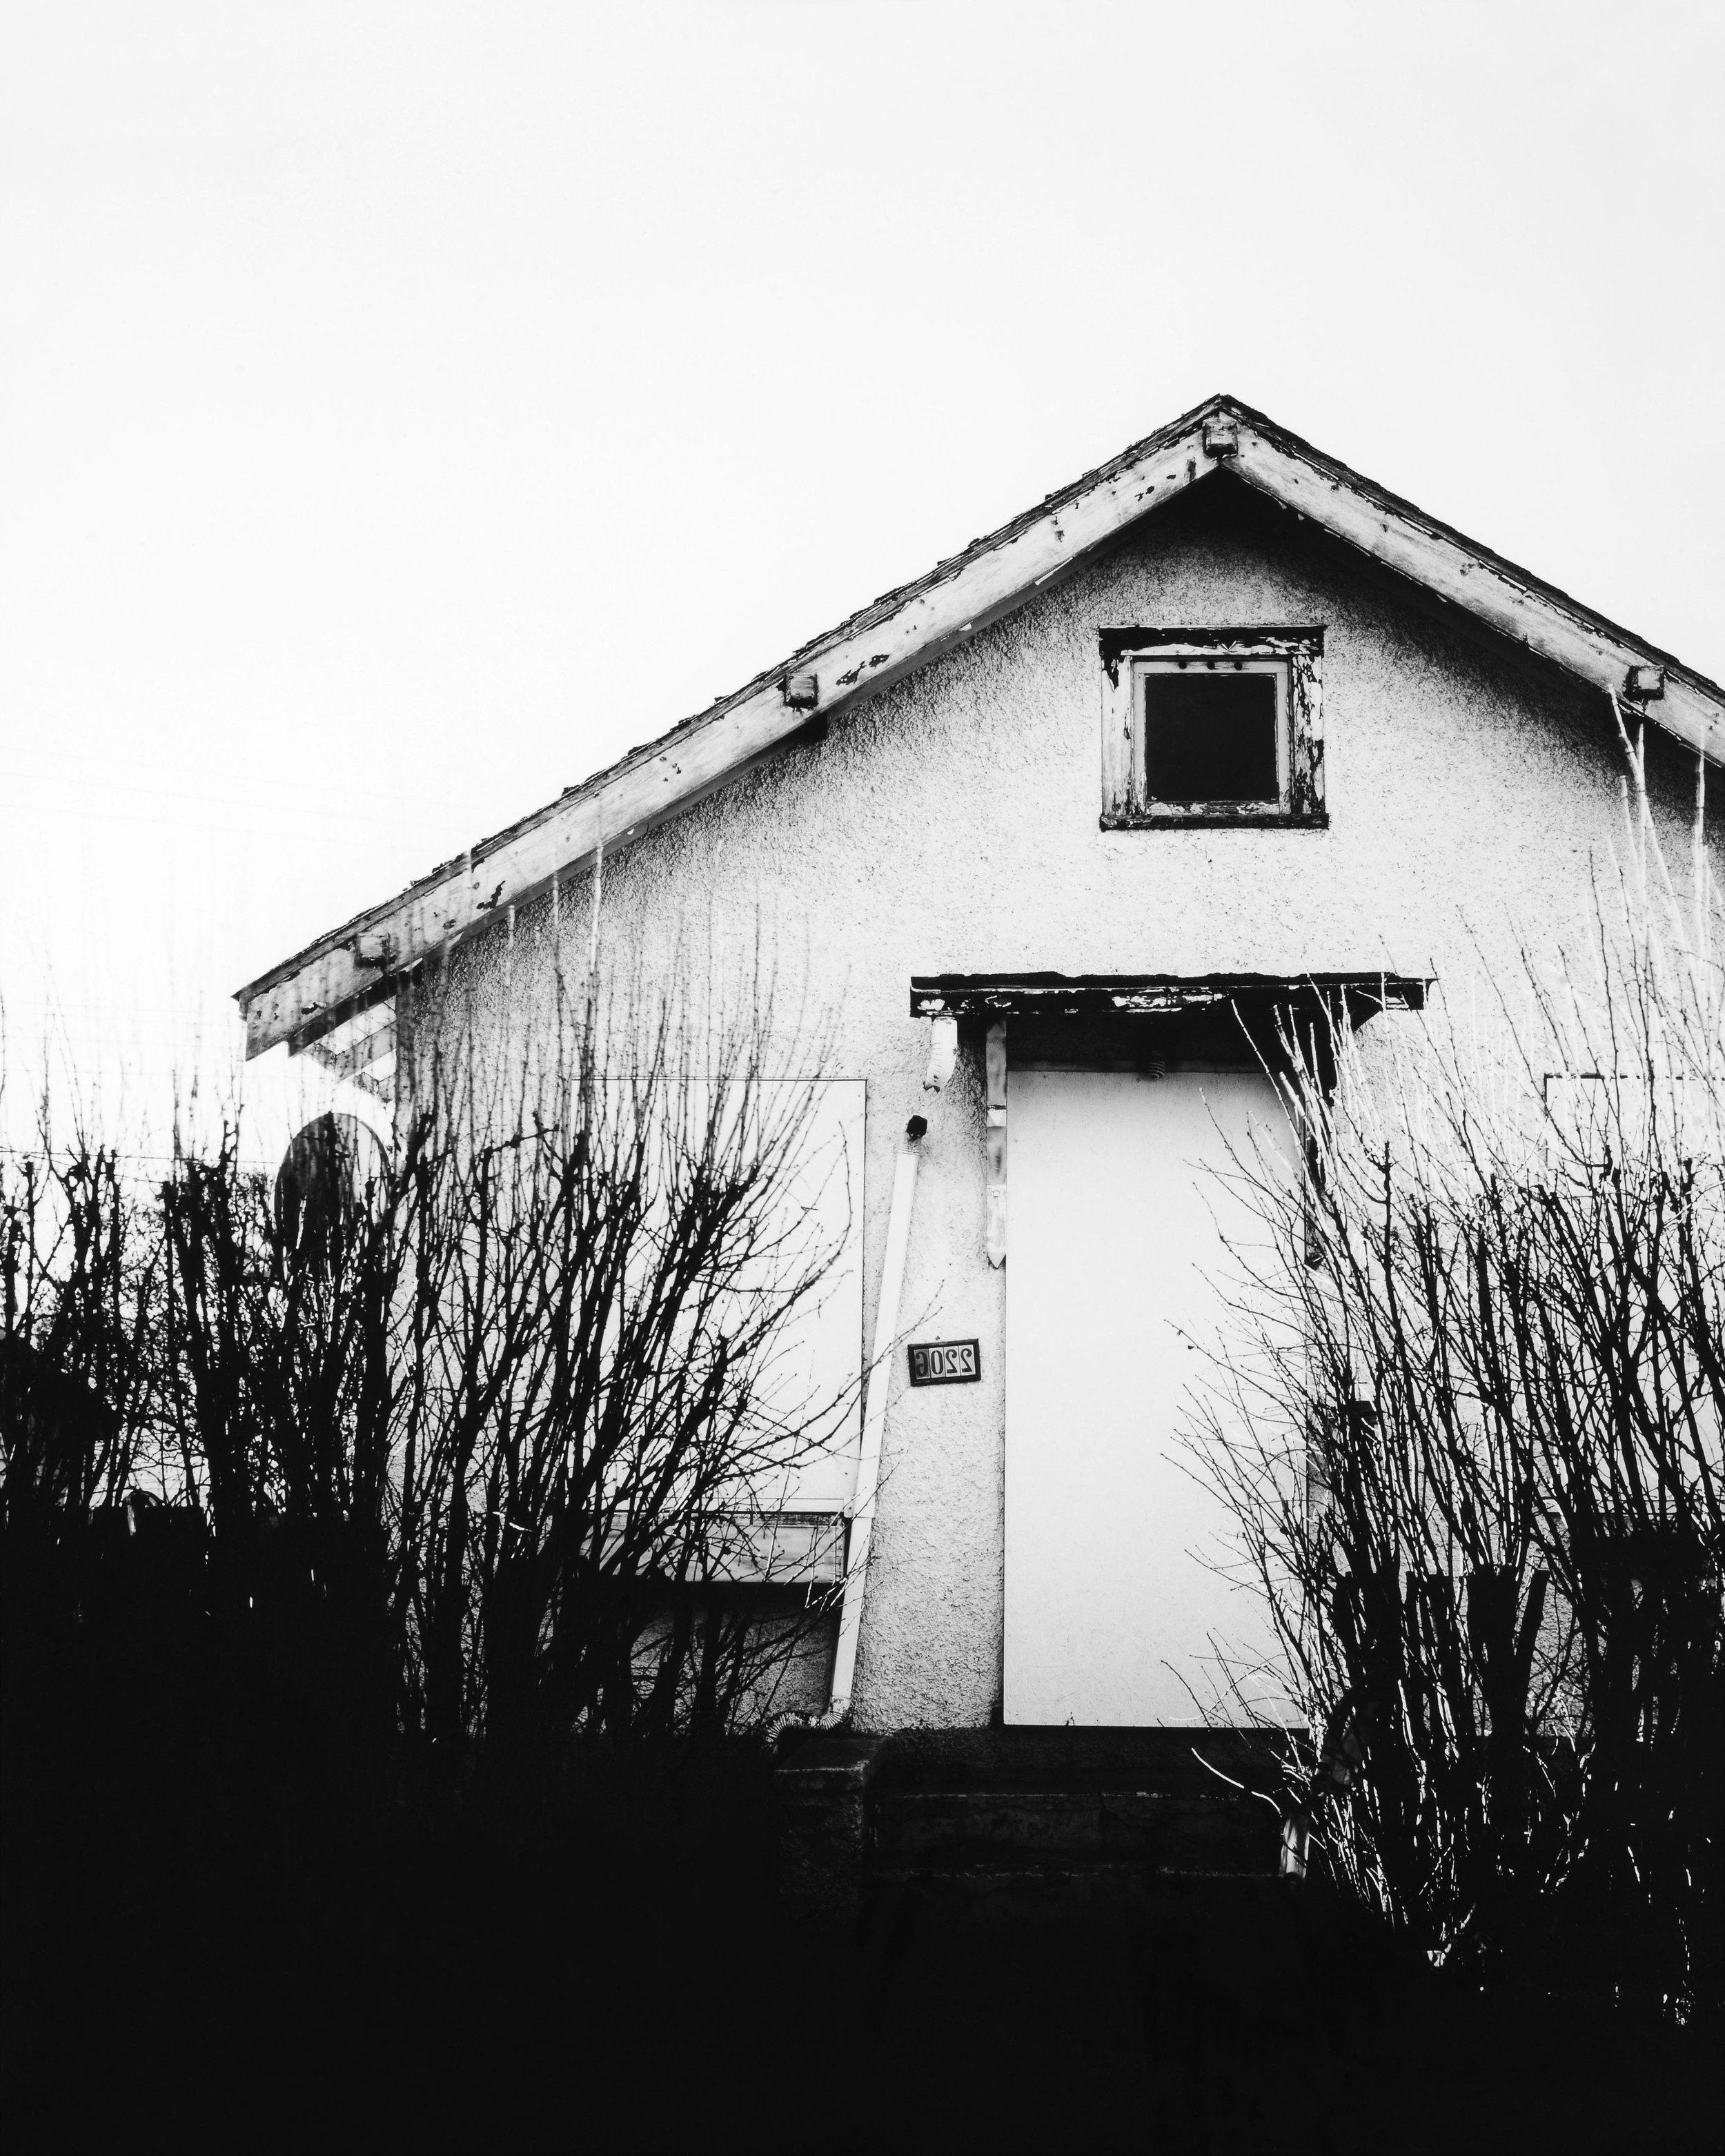 Reproduction - House Two - Print - No Border.jpg